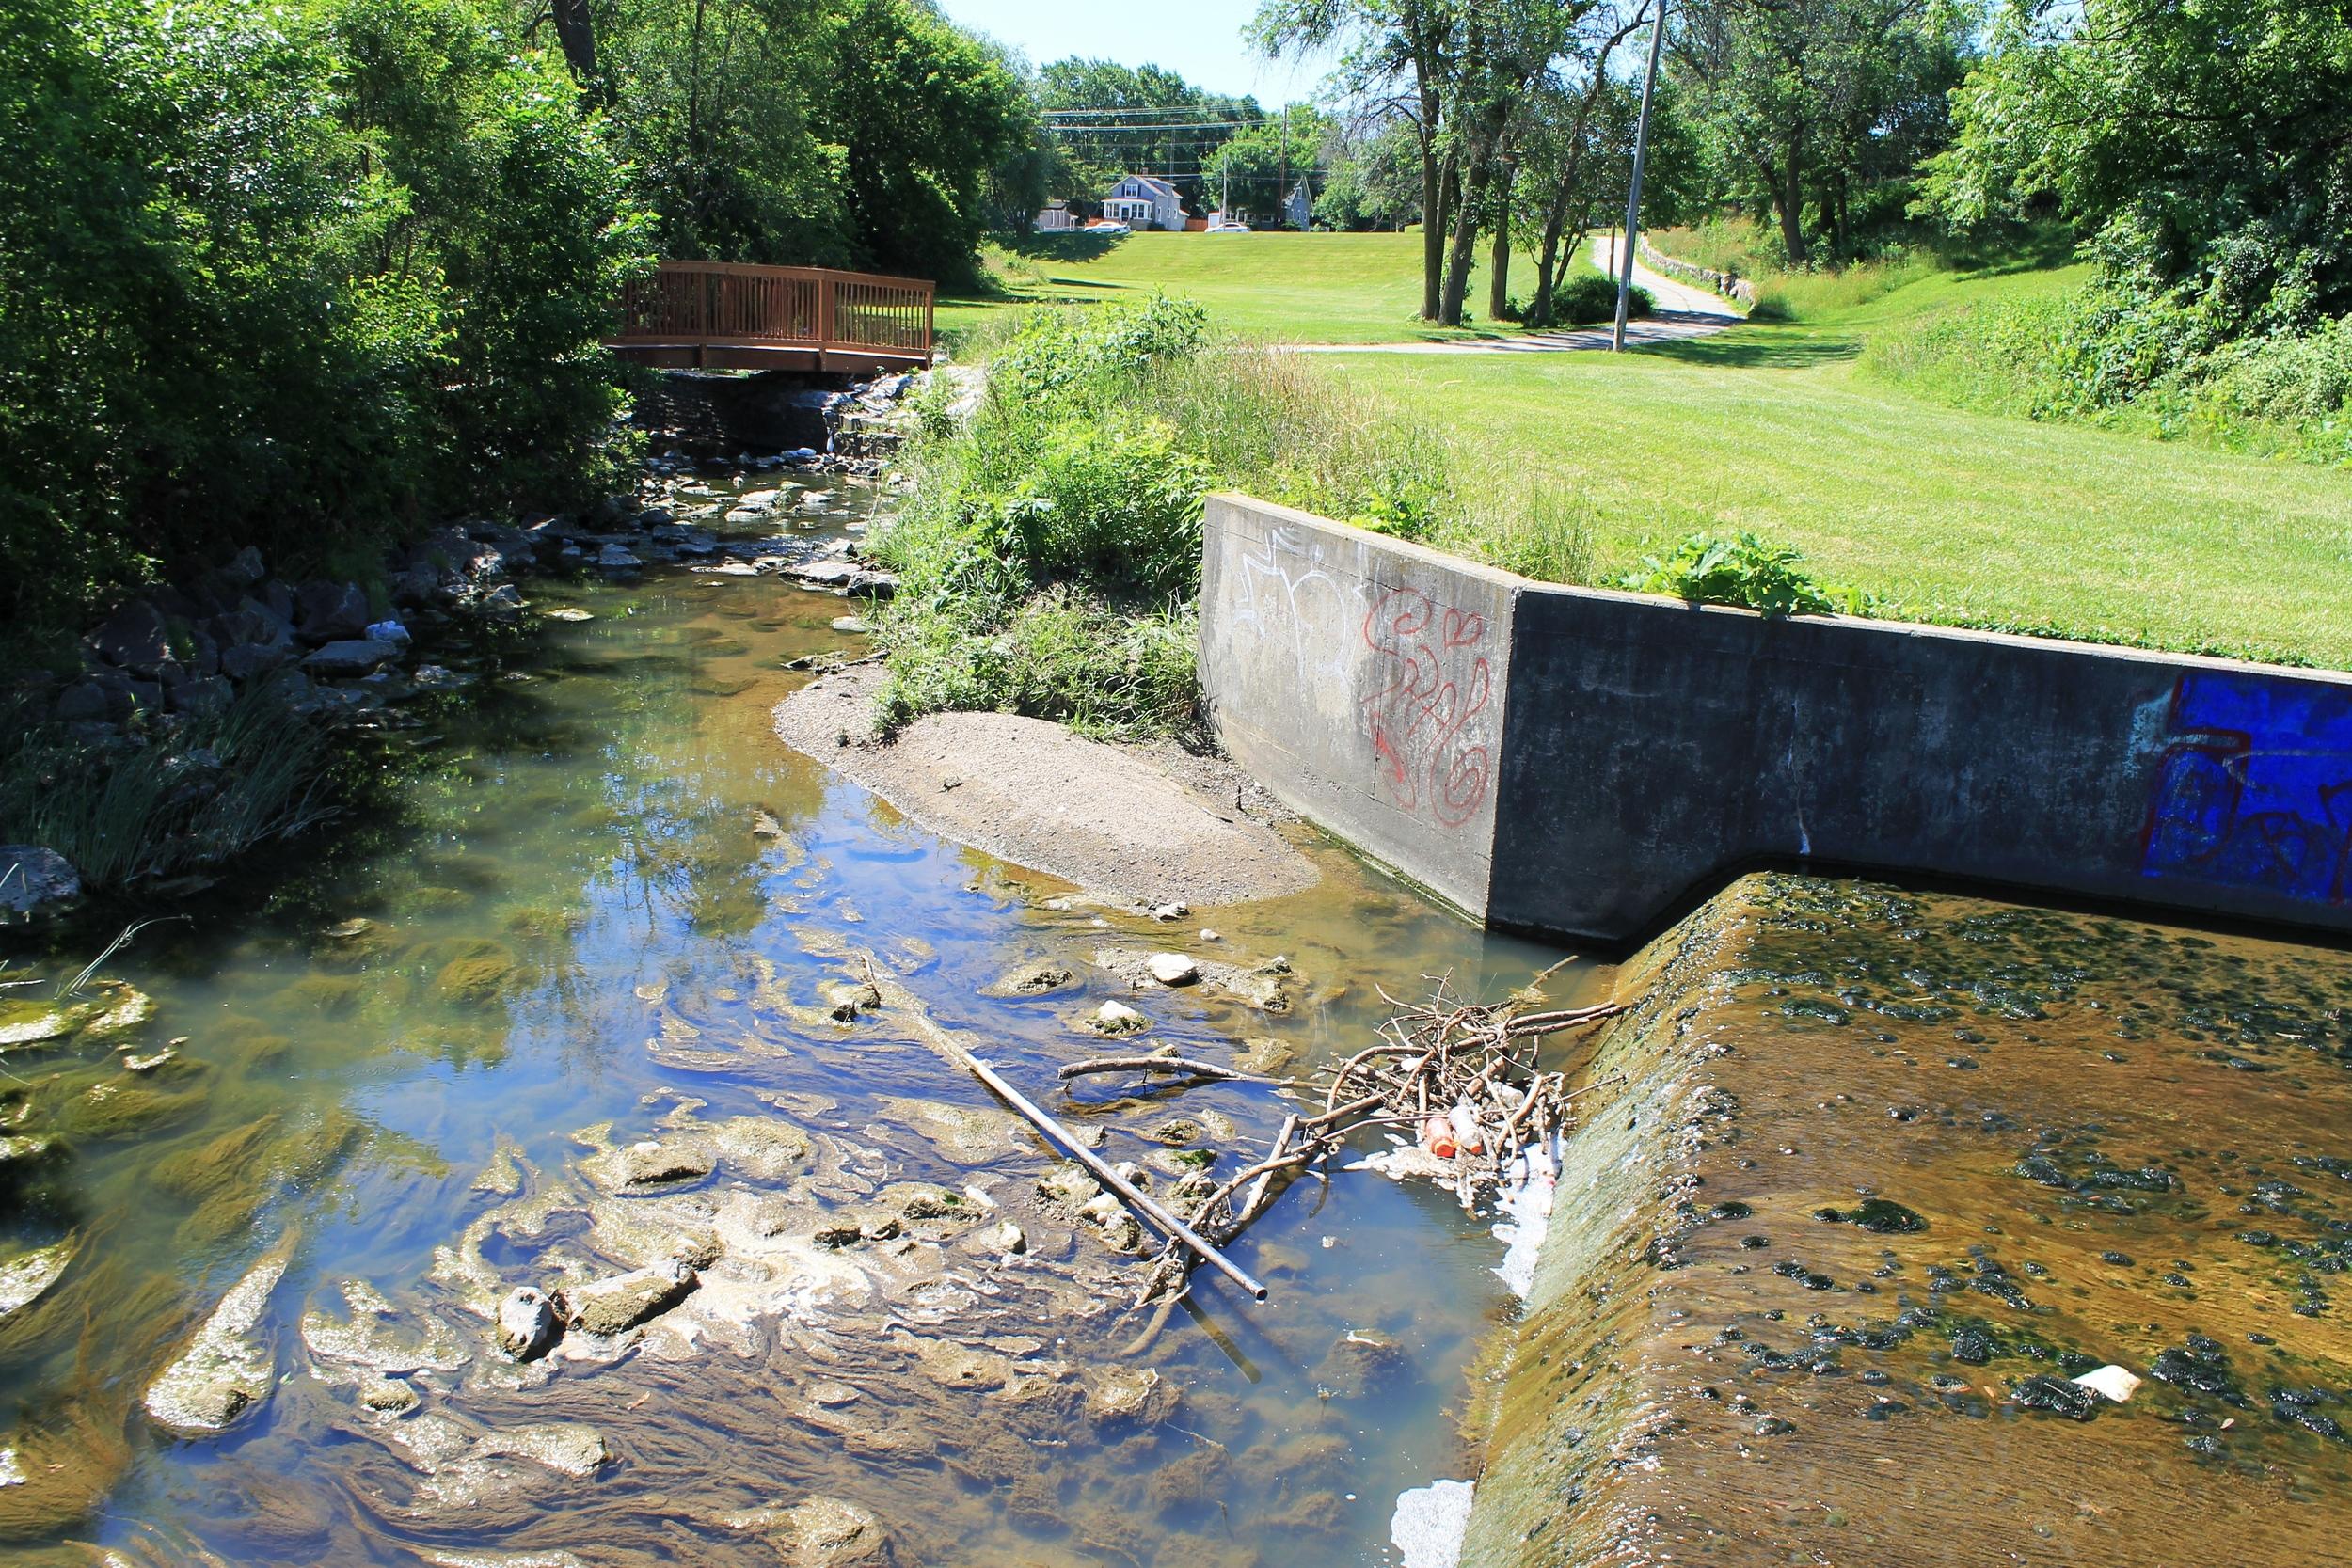 Pike Creek following through Washington Park in the City of Kenosha